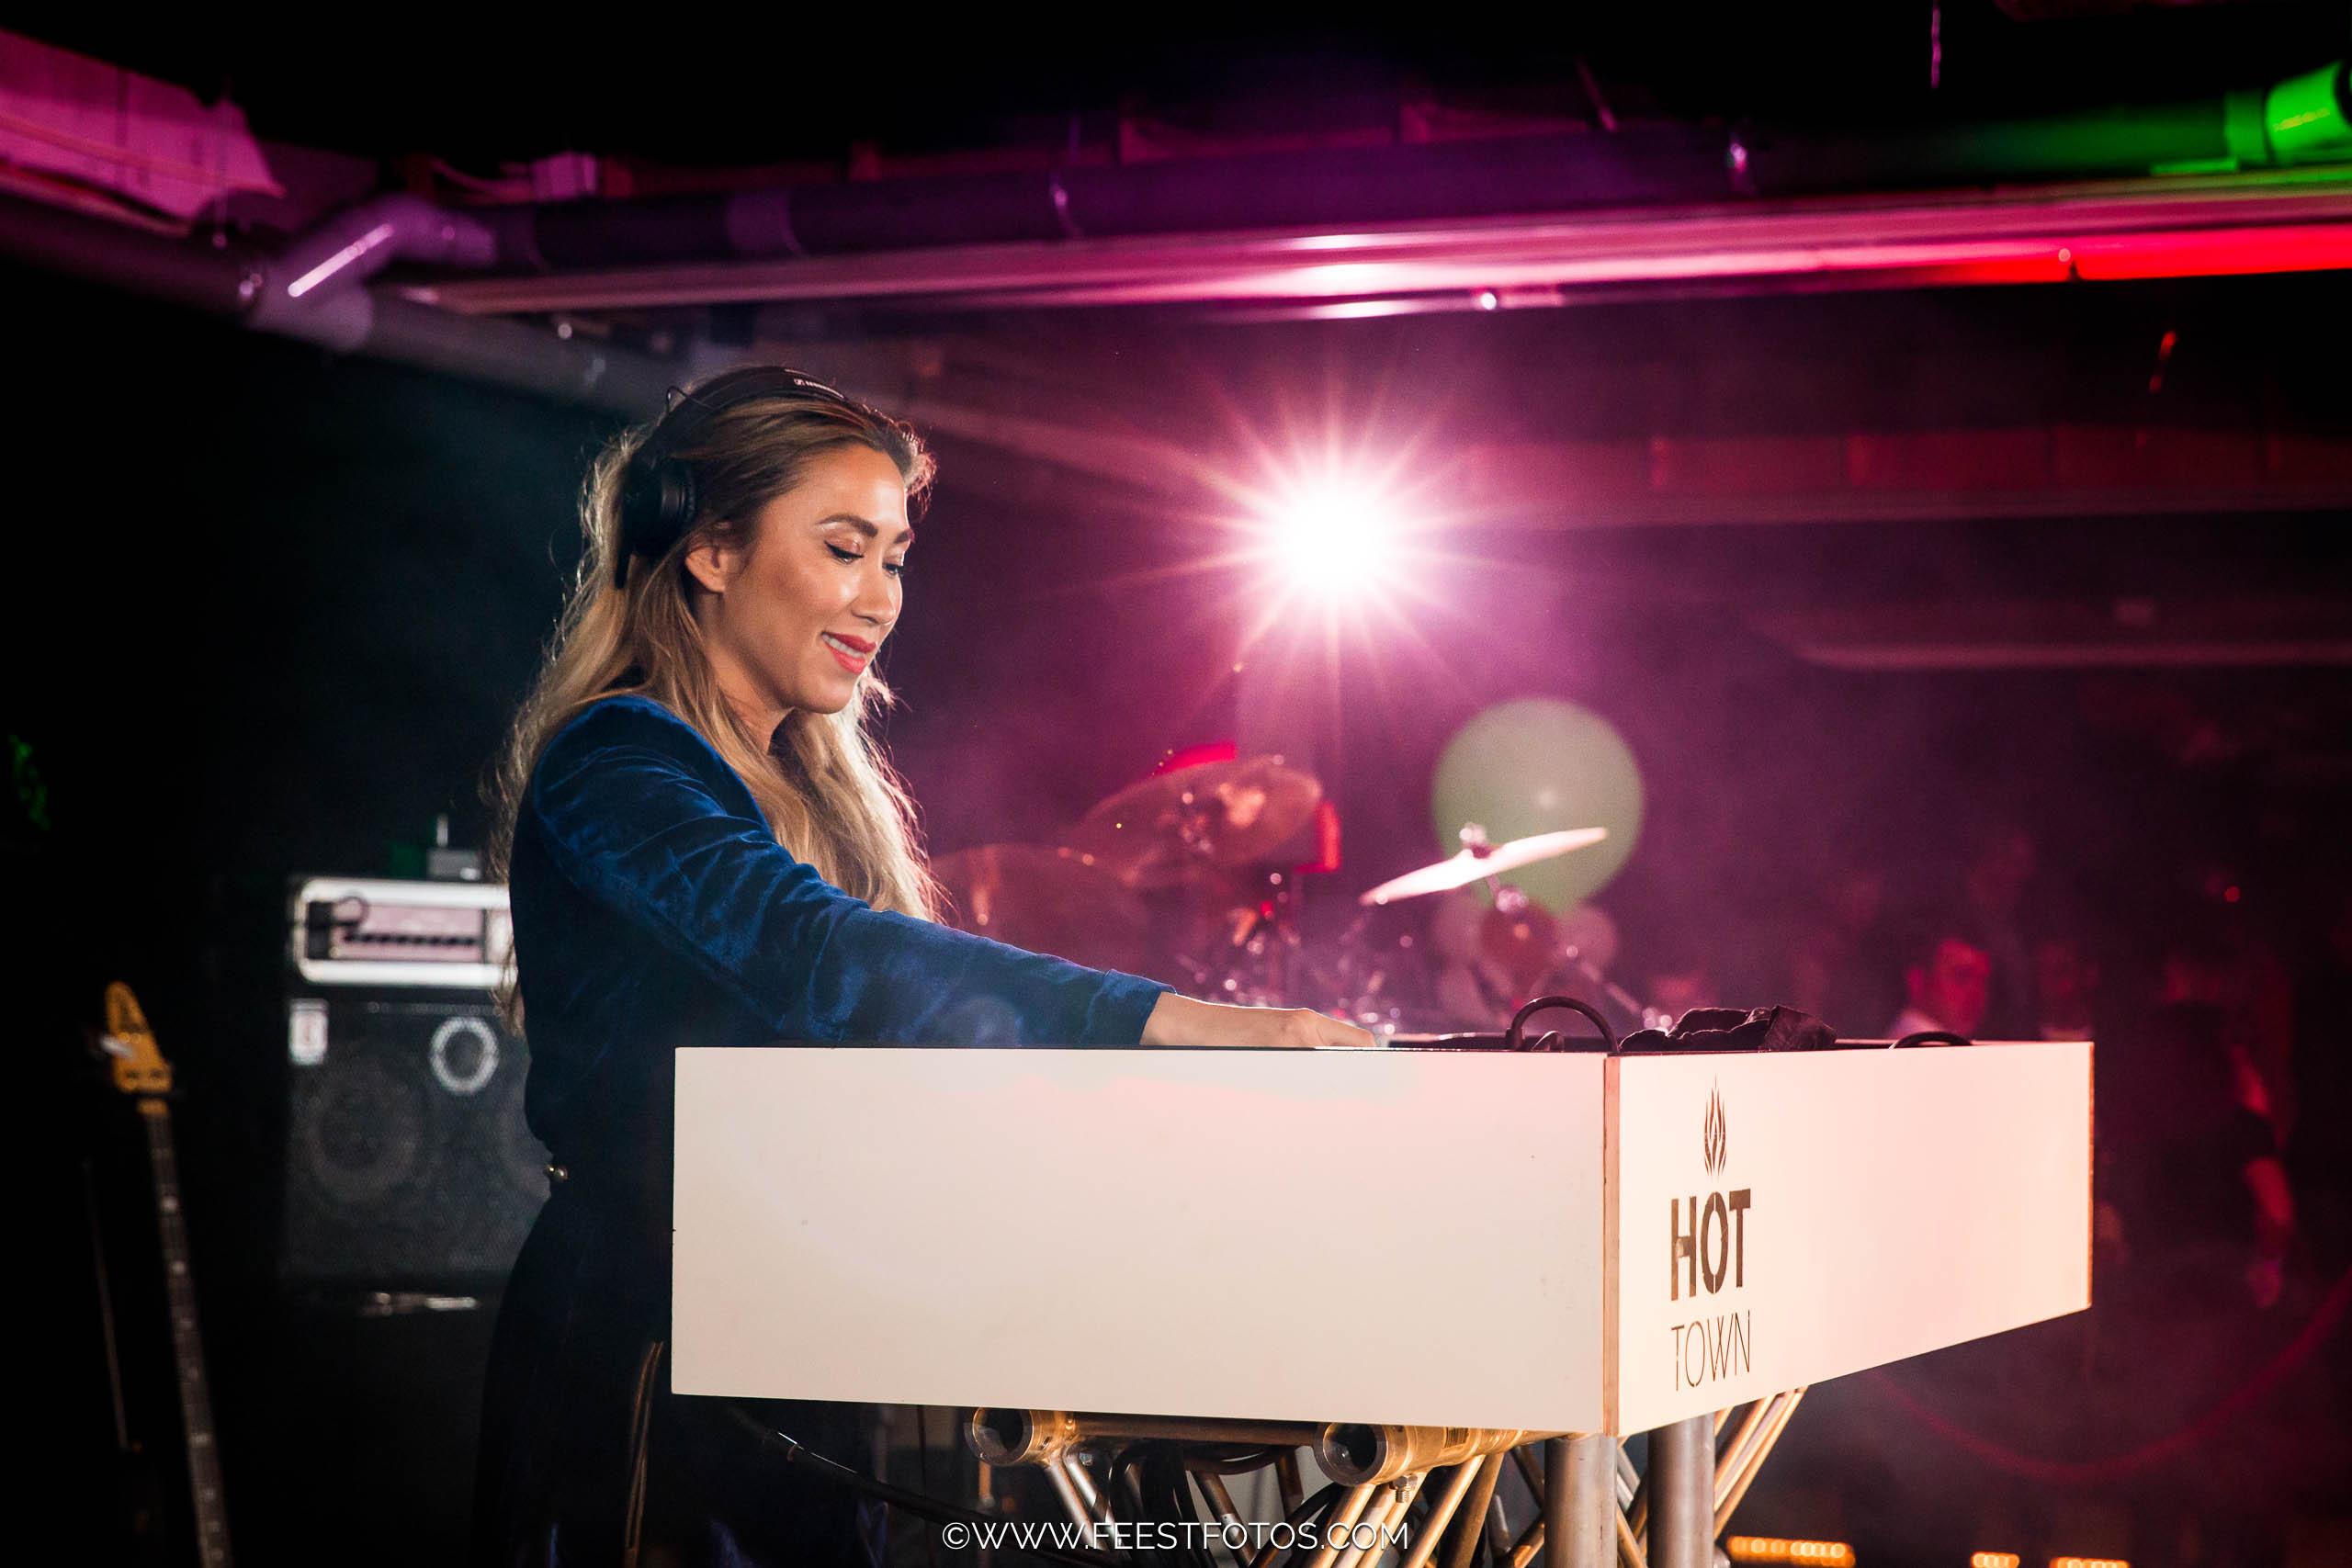 Vrouwelijke DJ